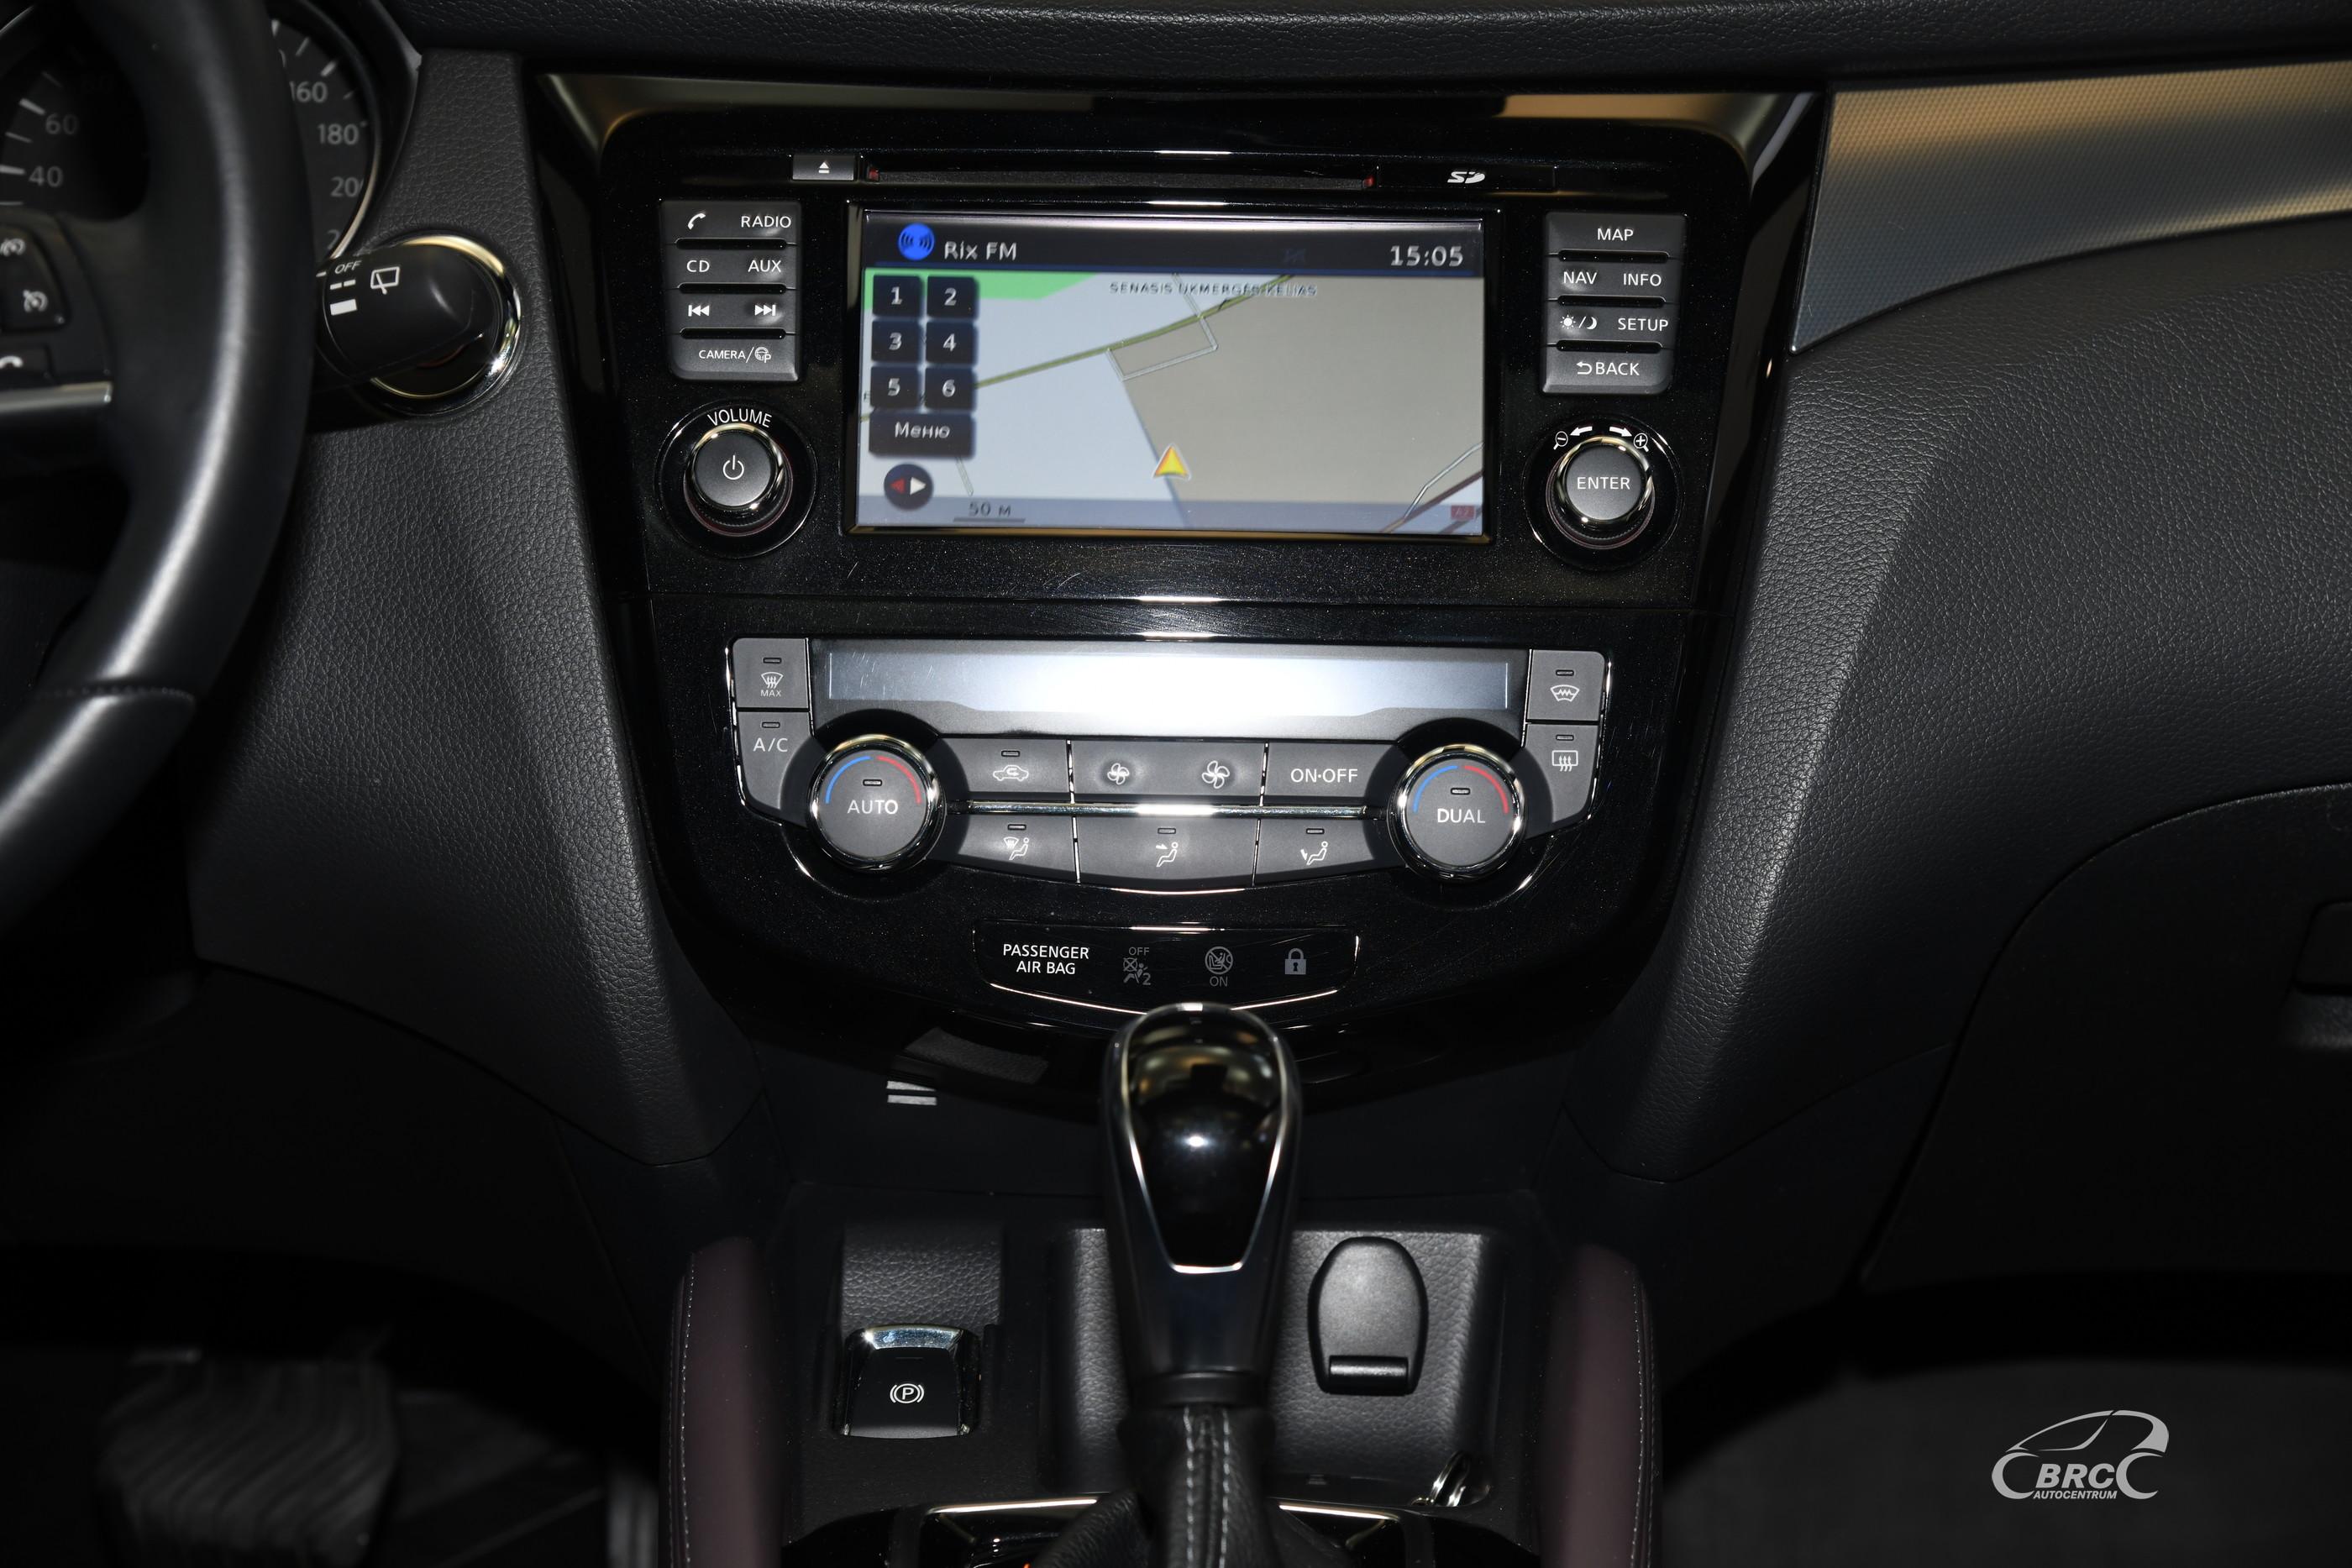 Nissan Qashqai 1.2 DIG-T Automatas